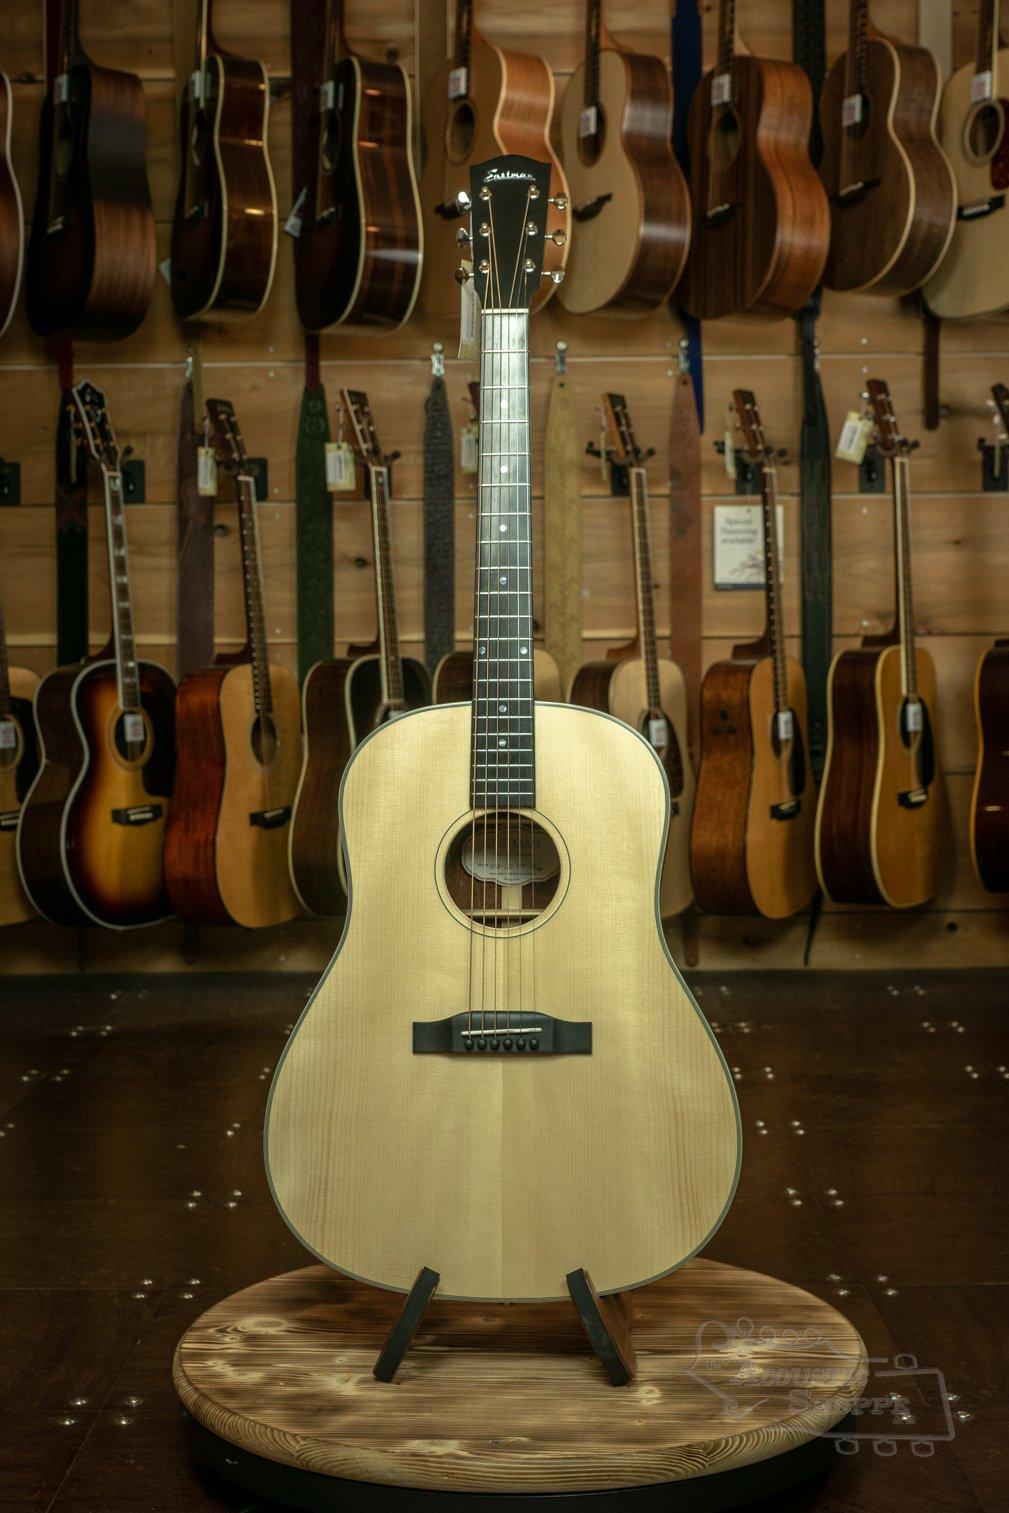 Eastman E1SS-LTD Slope Shoulder Adirondack Top Limited Edition Dreadnaught Acoustic #84/250